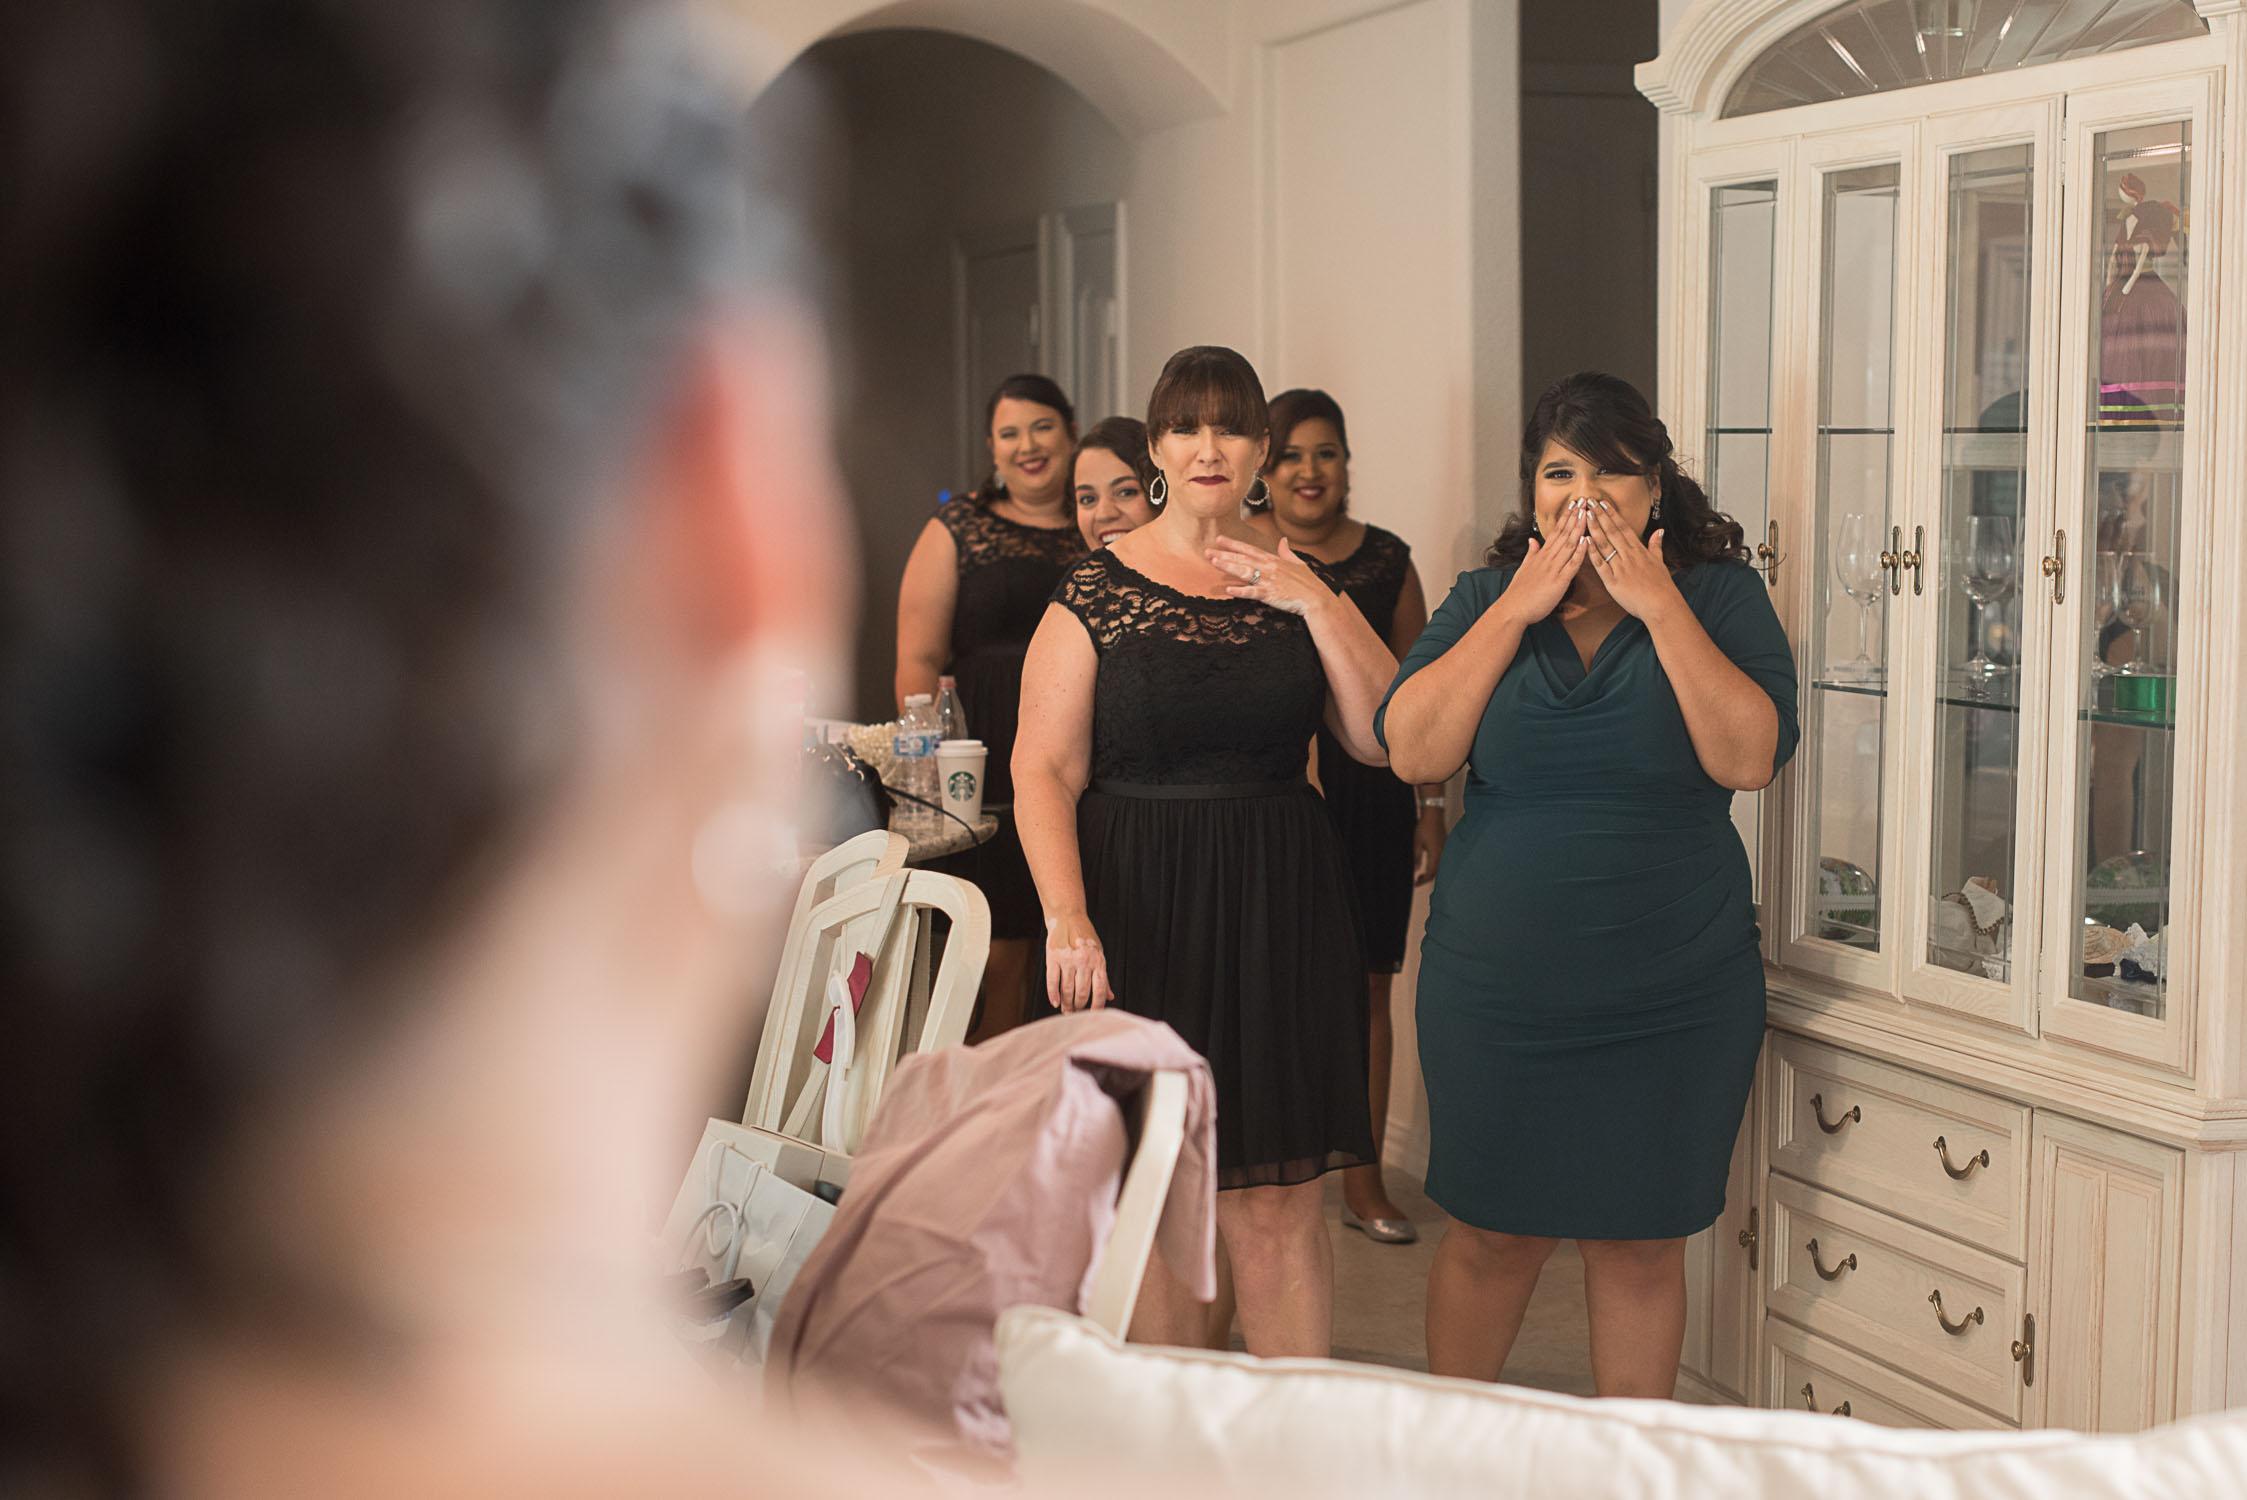 Leal Wedding Mira Visu Photography-63.jpg